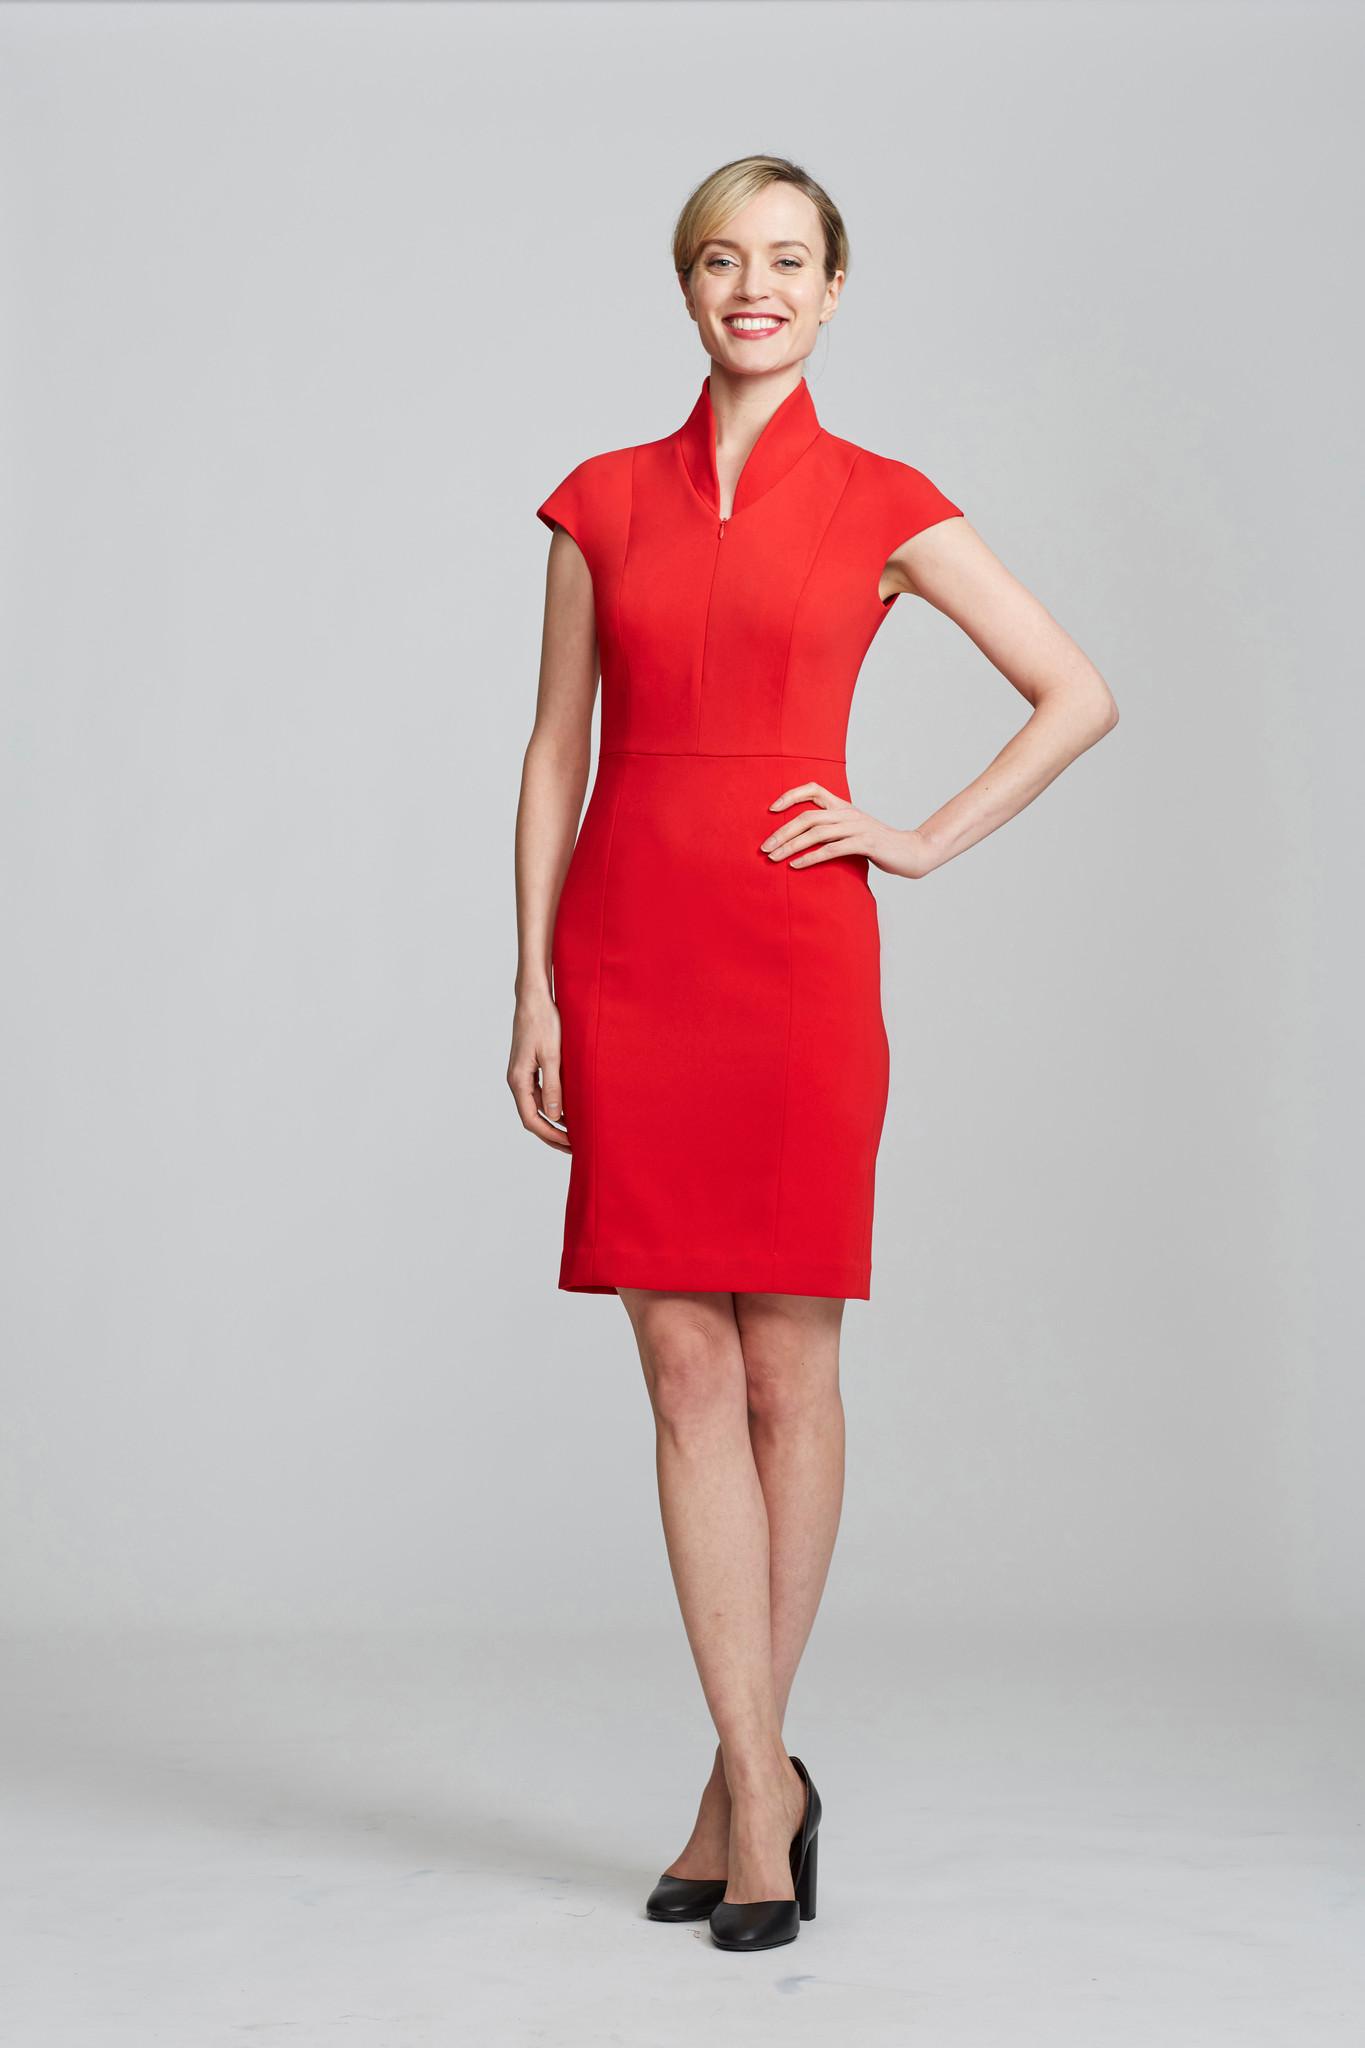 nora gardener interview - the evelyn dress power red - briar prestidge - deals in high heels